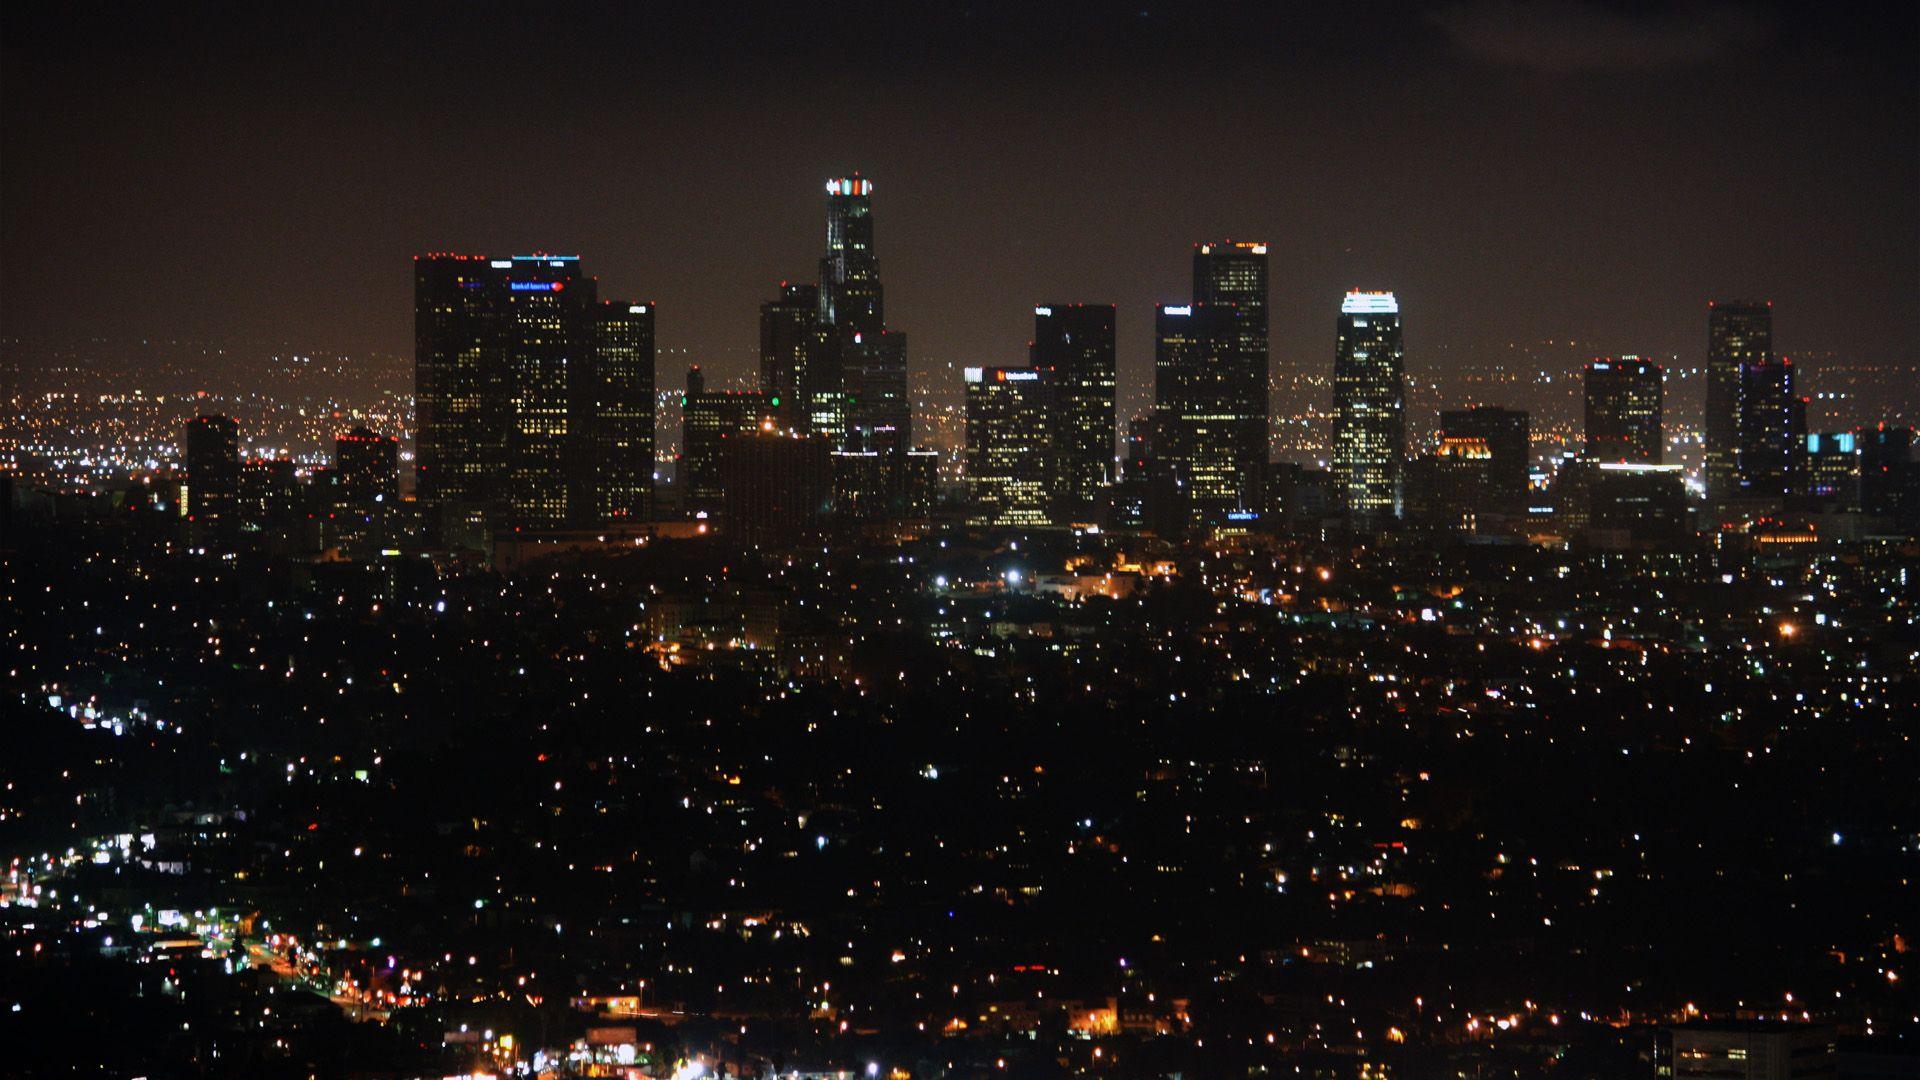 Los Angeles Skyline At Night Wallpaper Google Search Los